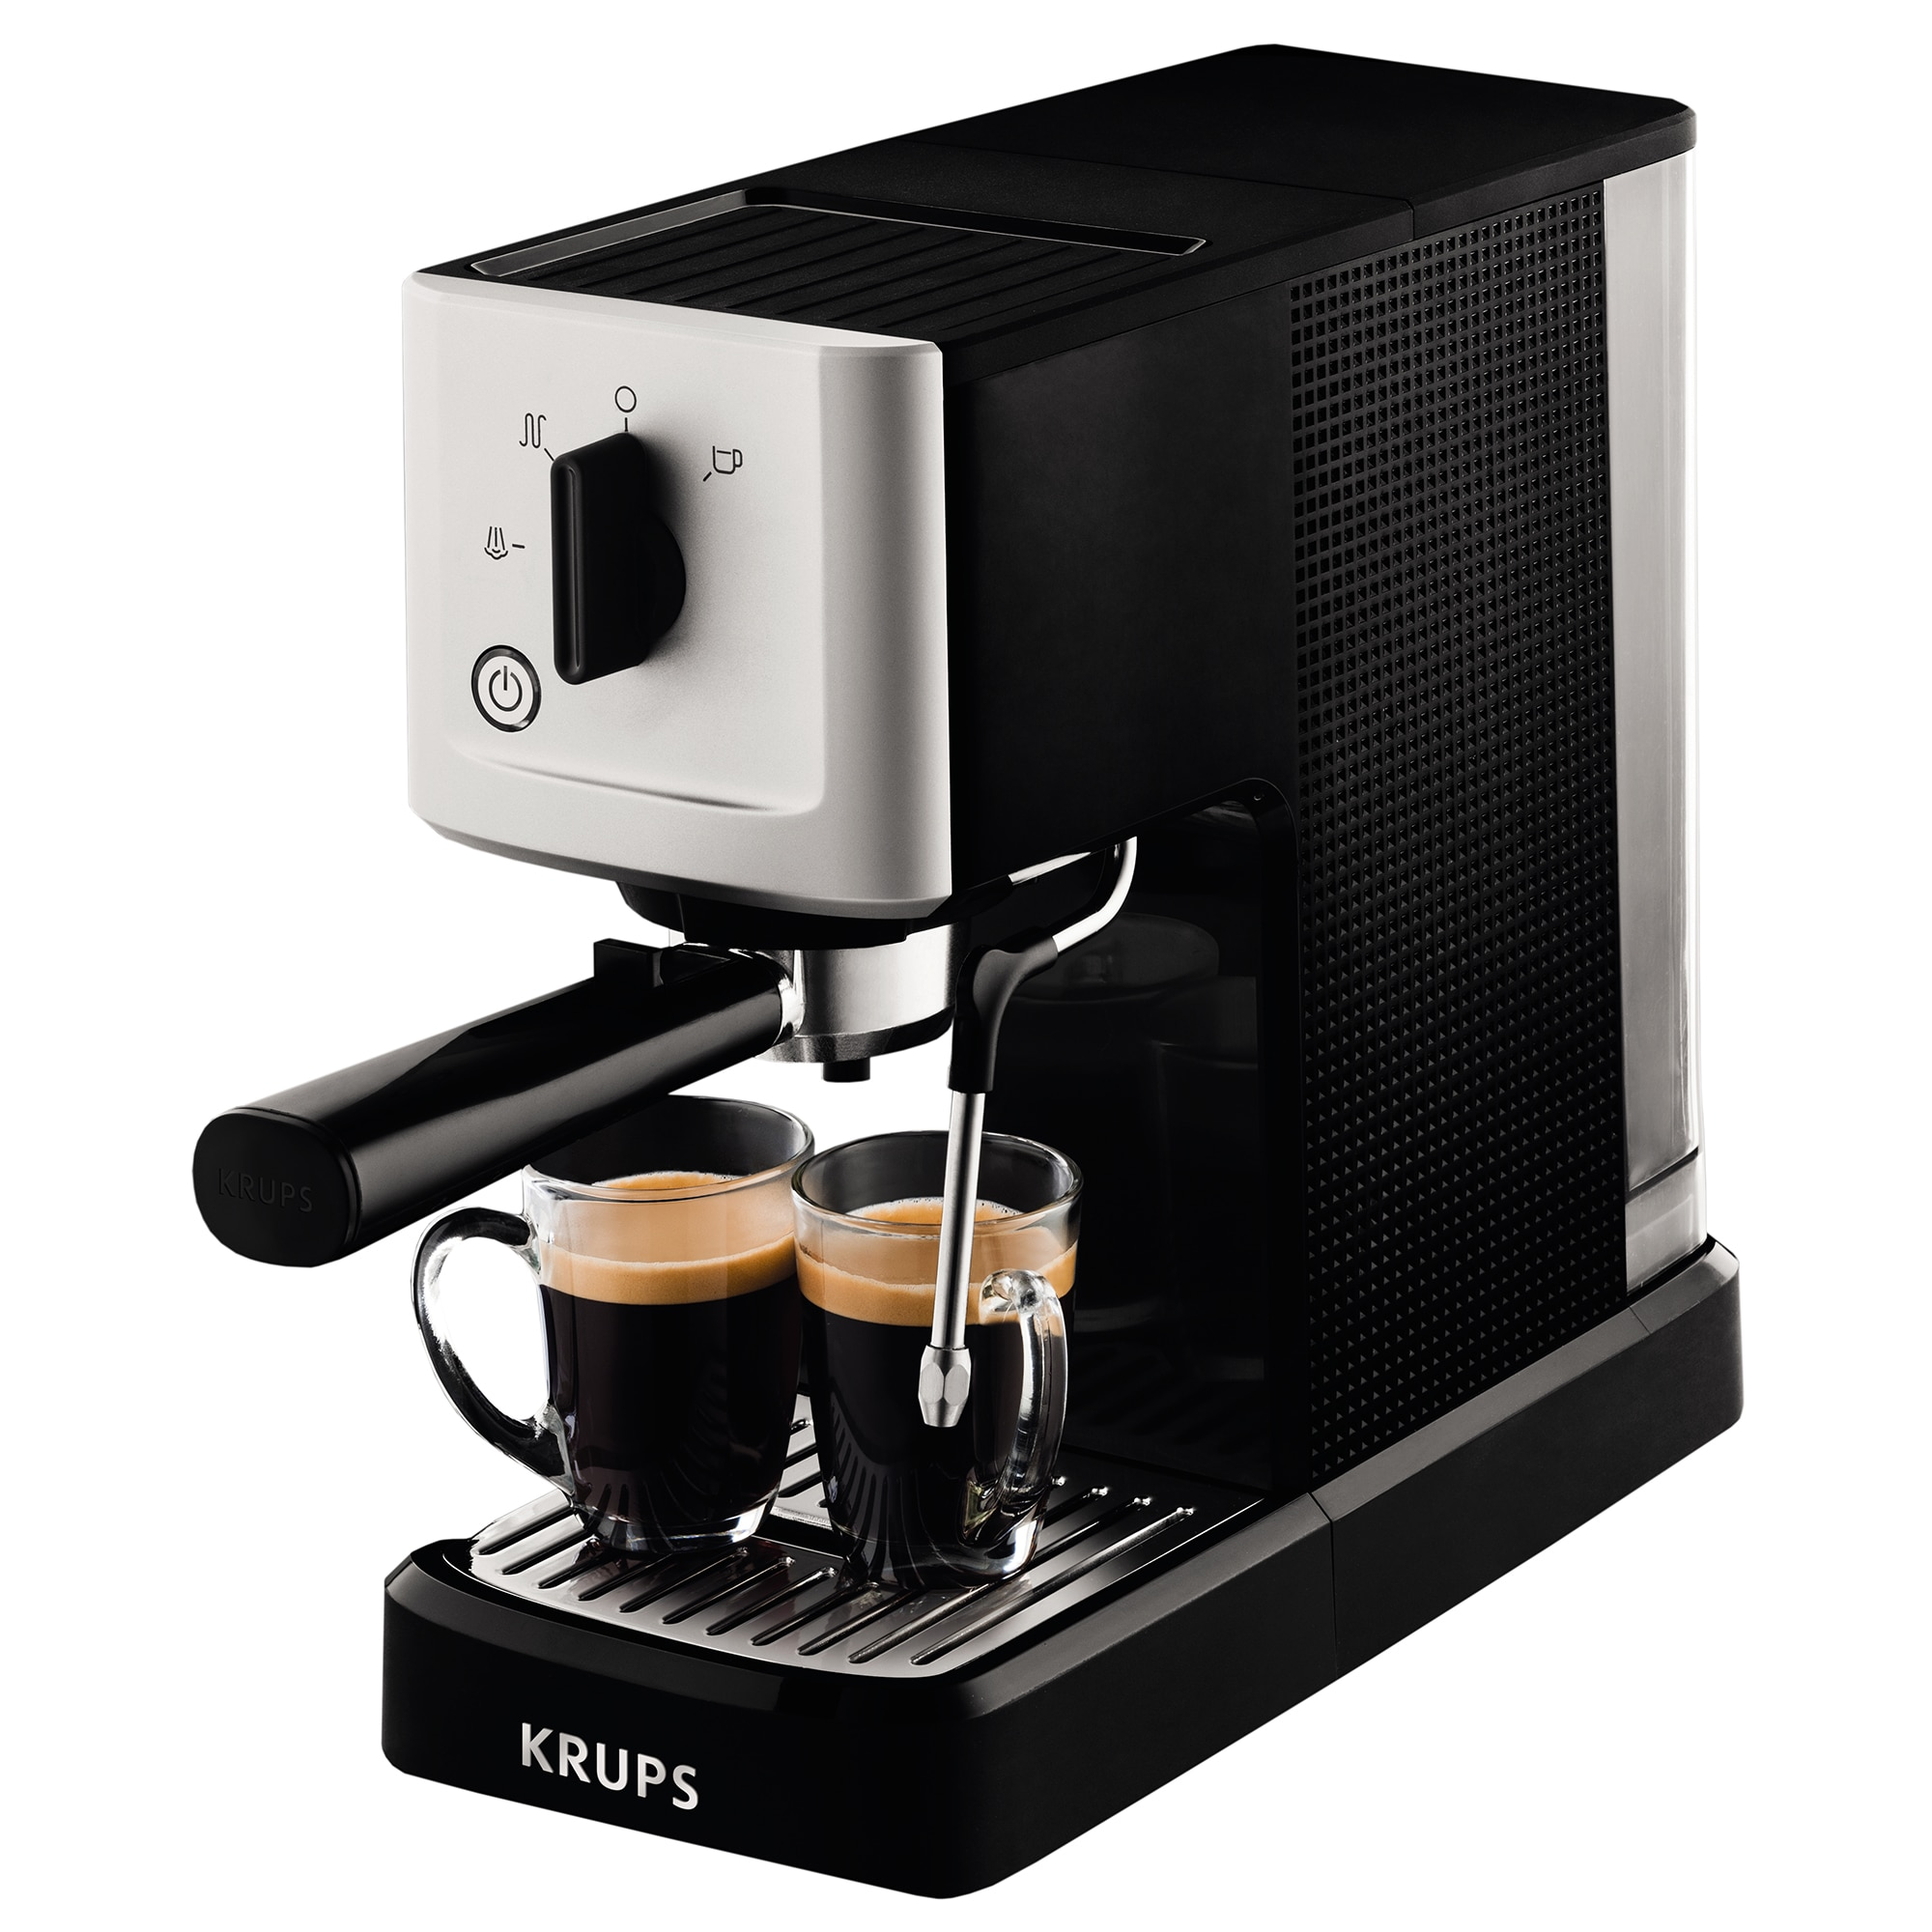 Fotografie Espressor manual Krups Calvi XP3440, 1460W, 15 bar, 1.1 l, Negru/Argintiu